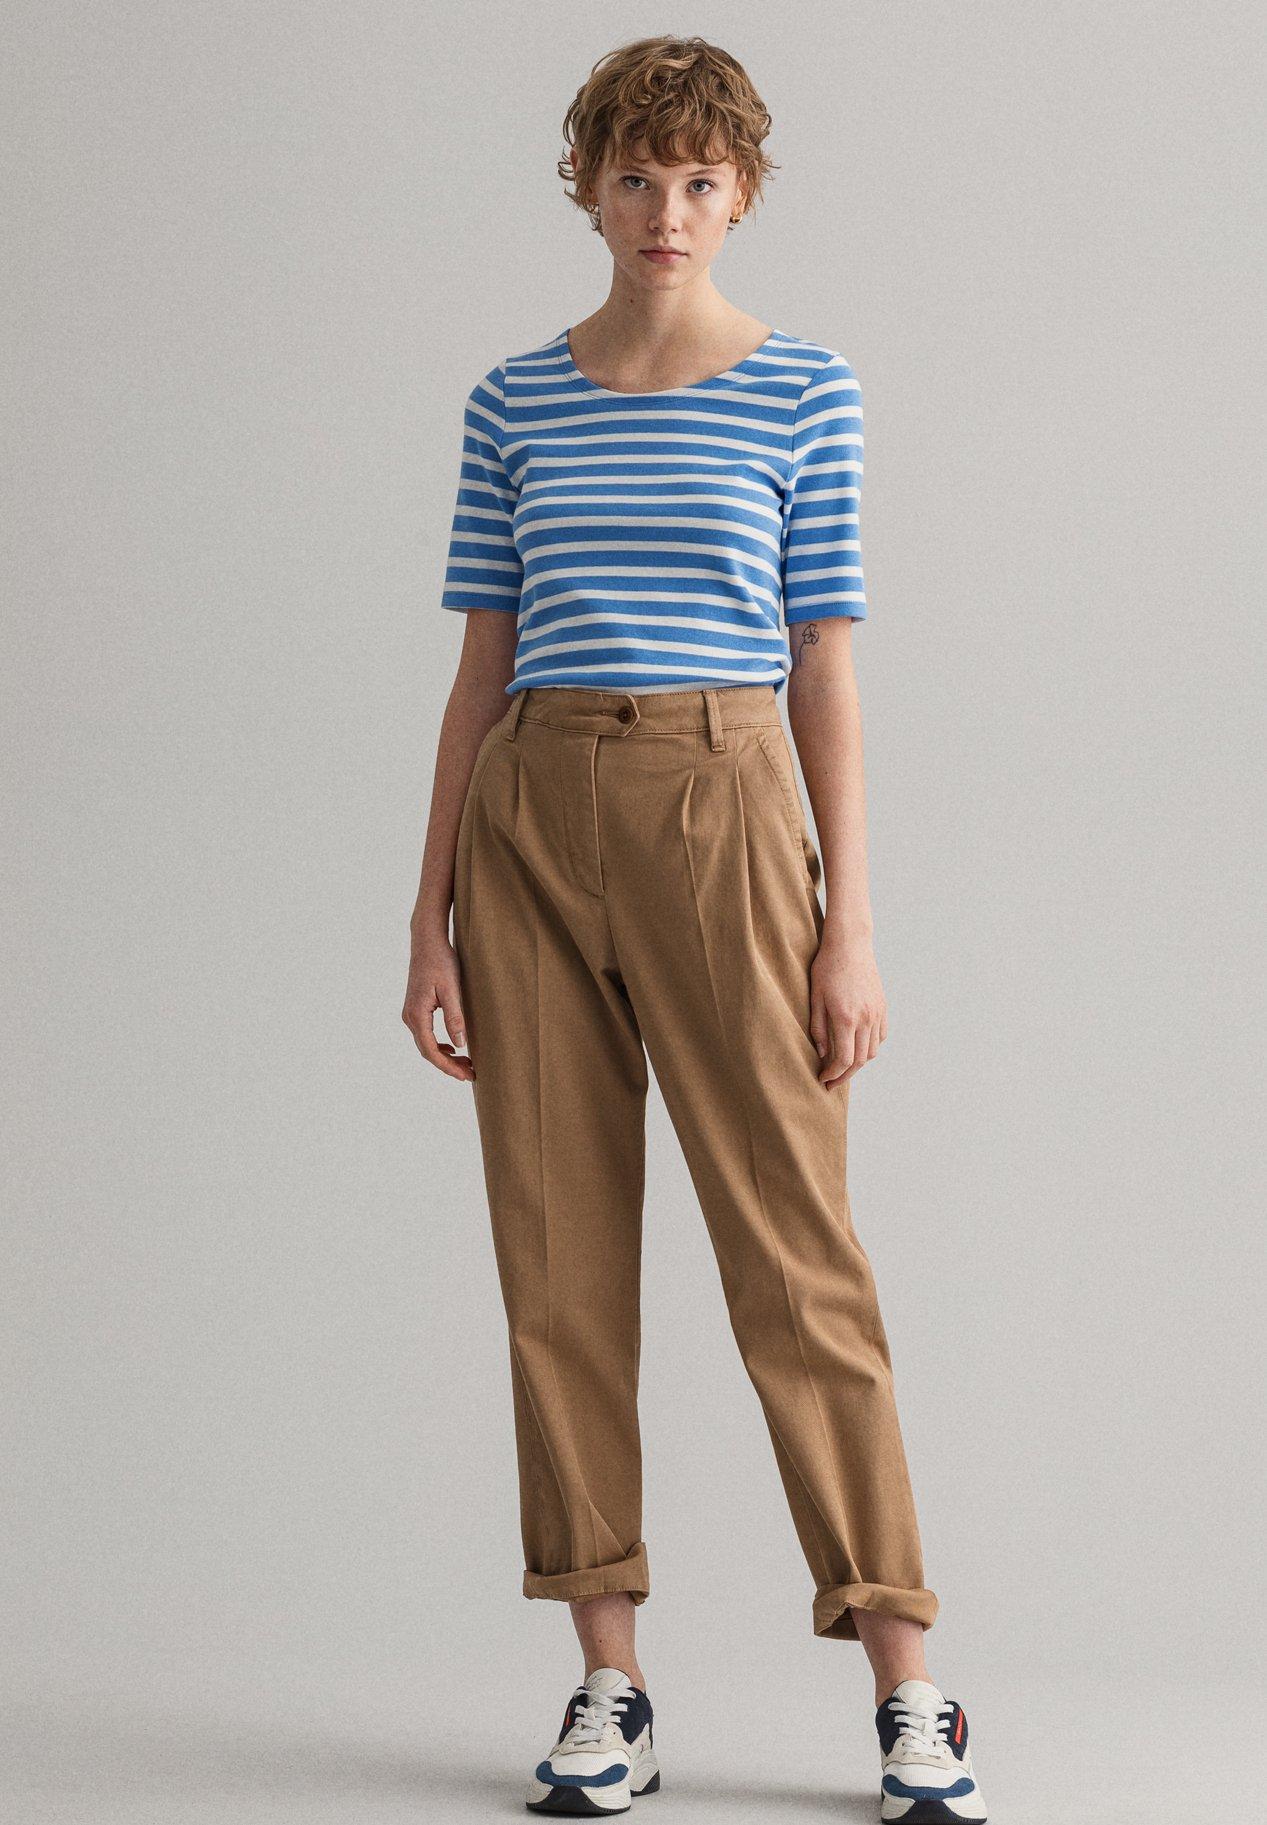 Damen GANT DAMEN SHIRT KURZARM - T-Shirt print - blau